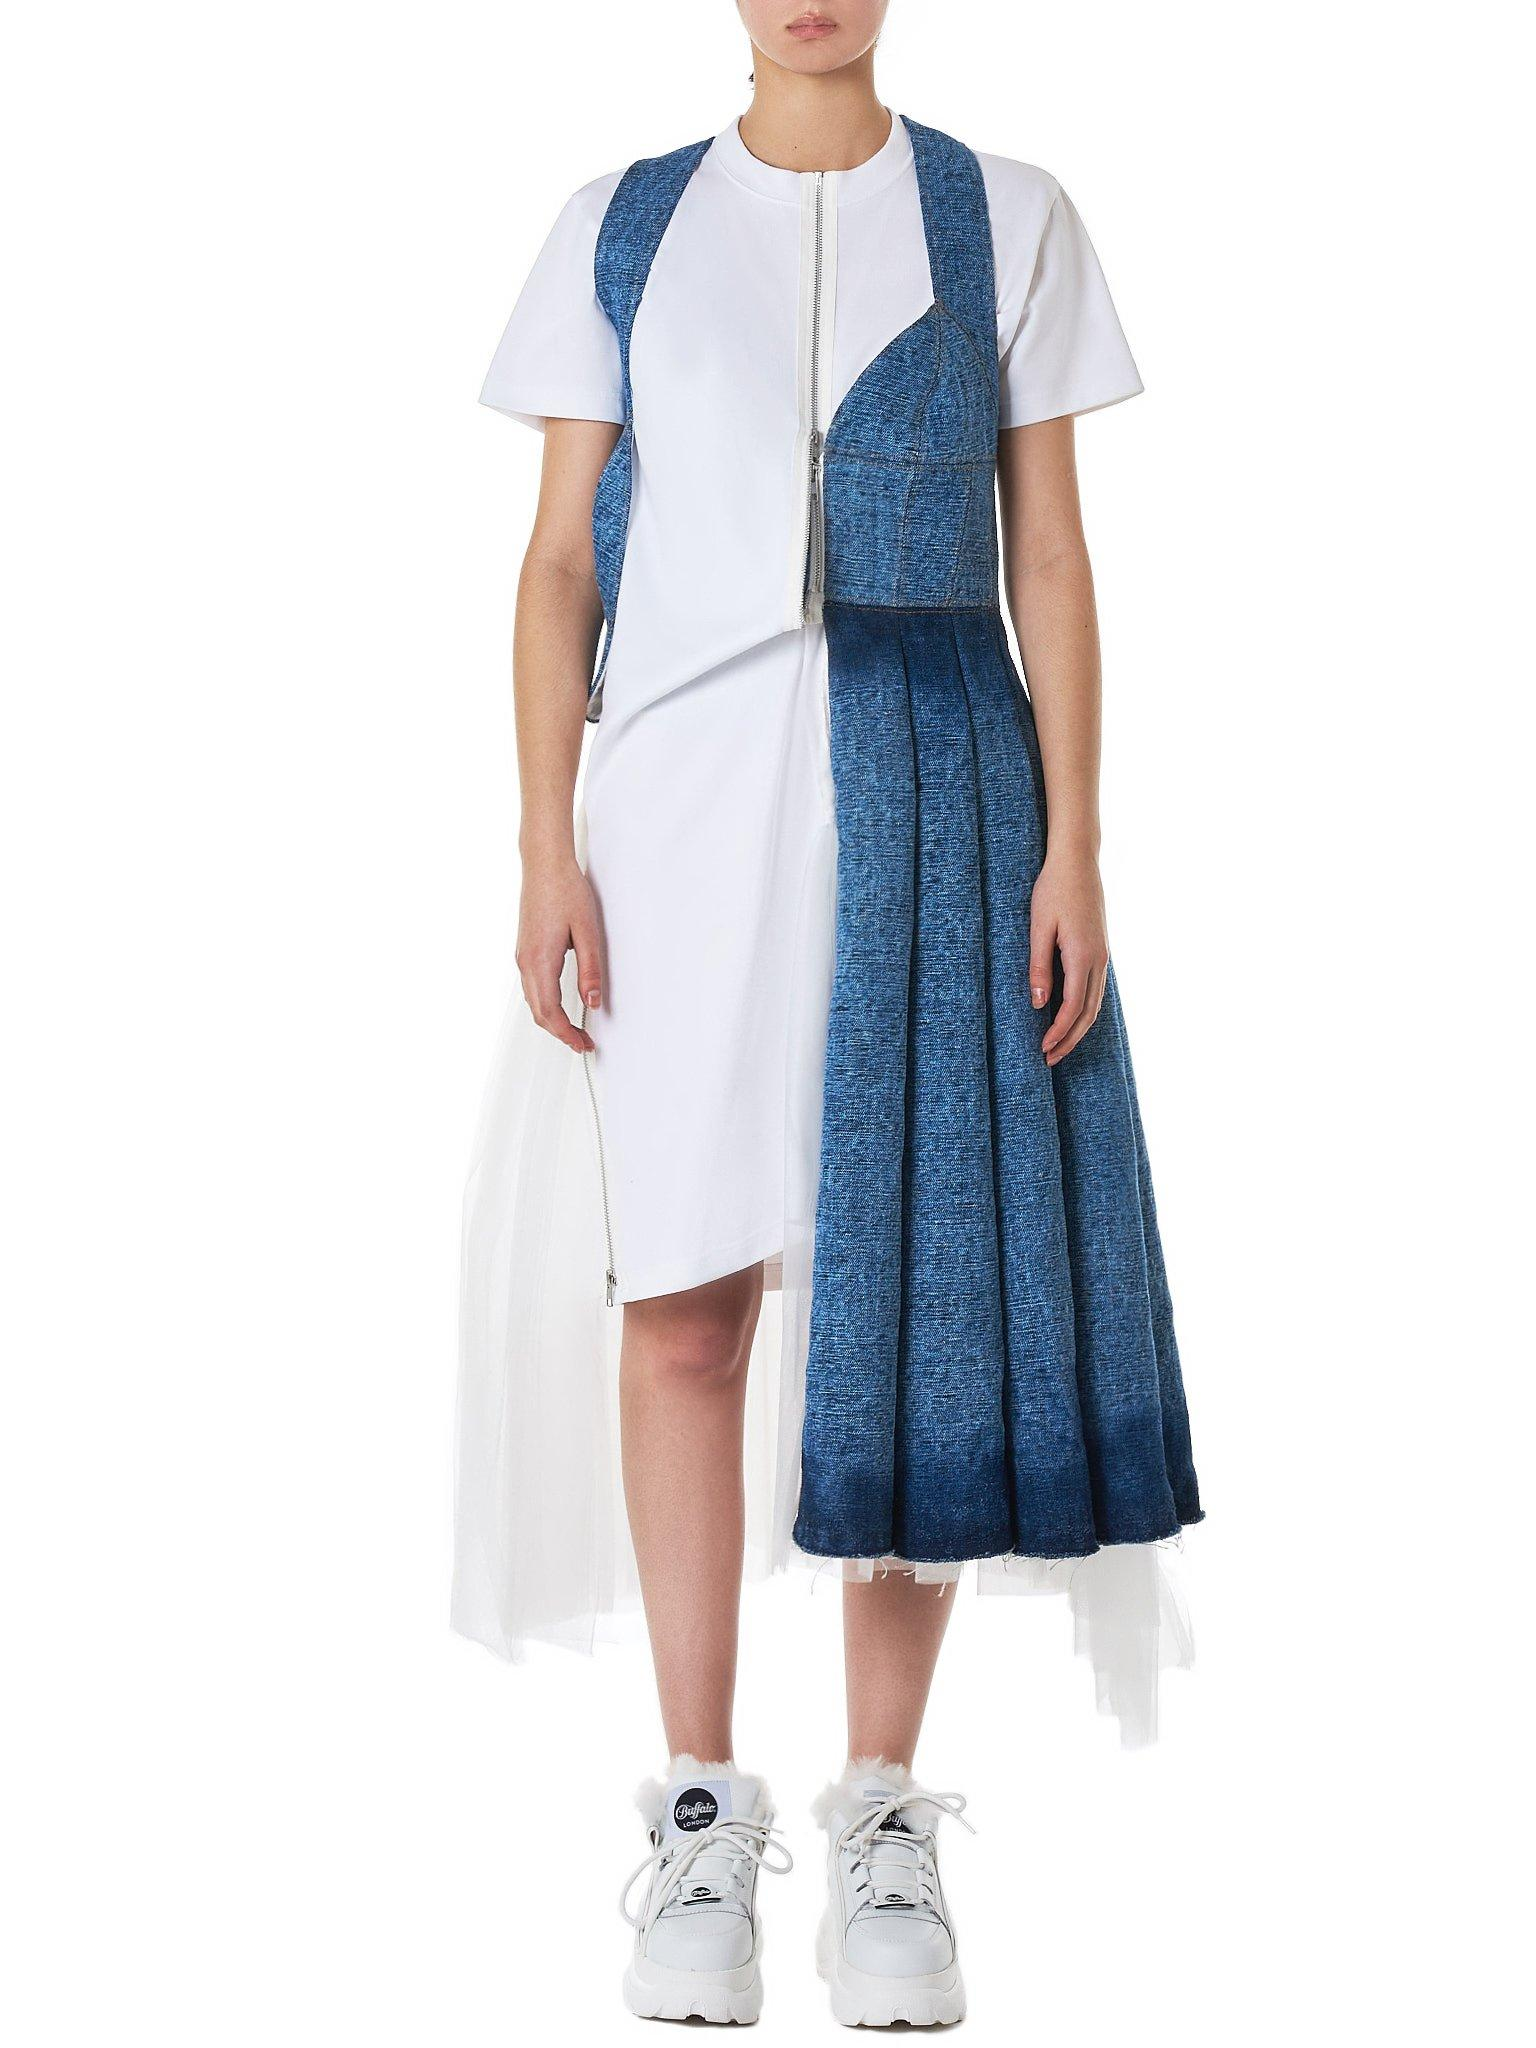 01e7a4db80f Lyst - Junya Watanabe T-shirt Dress in Blue - Save 13%